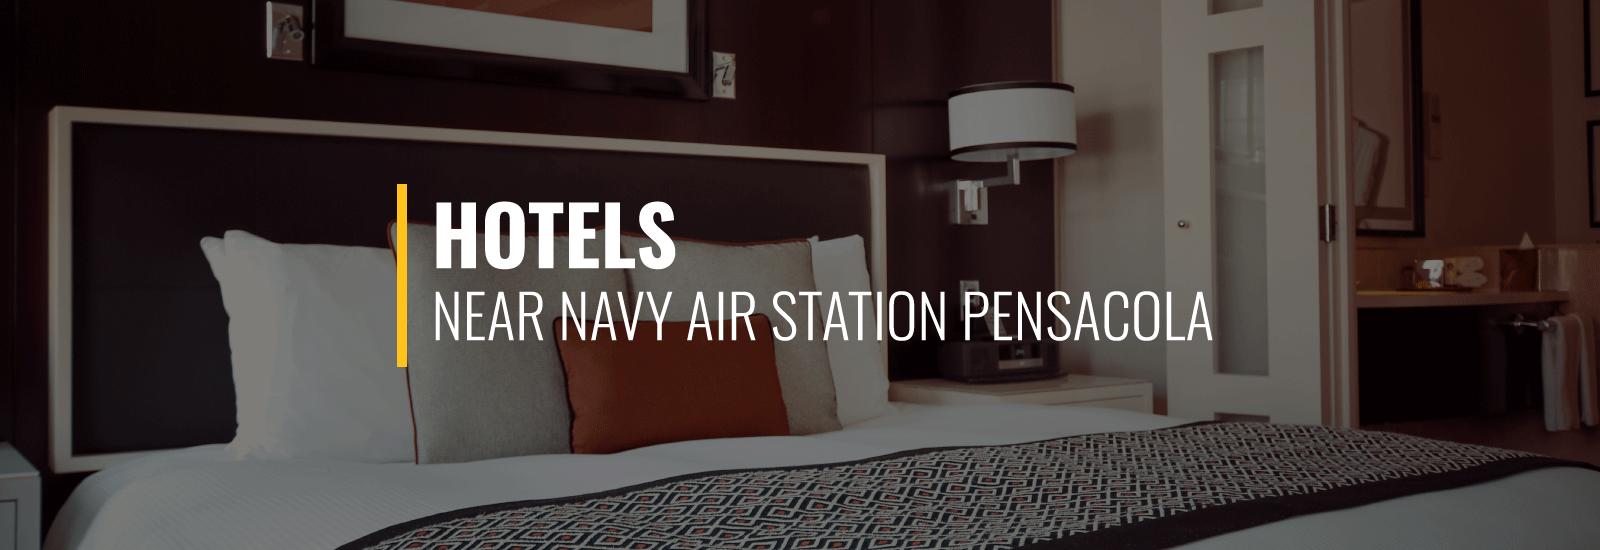 NAS Pensacola Hotels